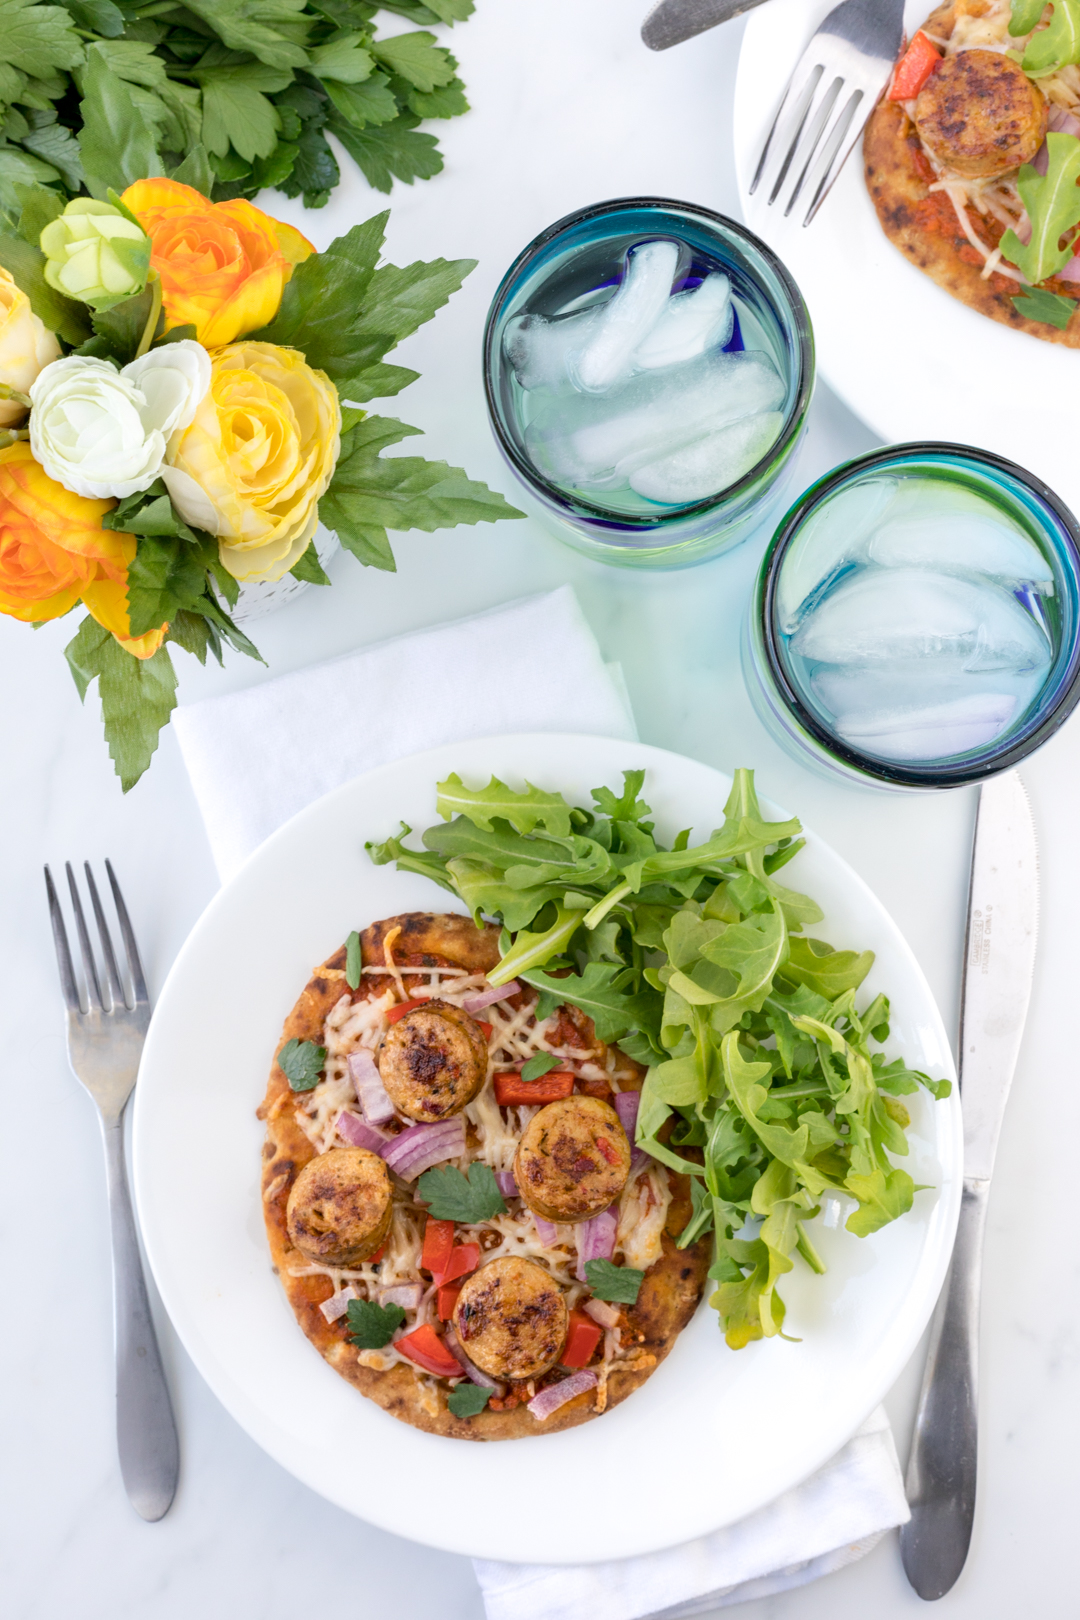 Sausage & Sundried Tomato Pesto Flatbread